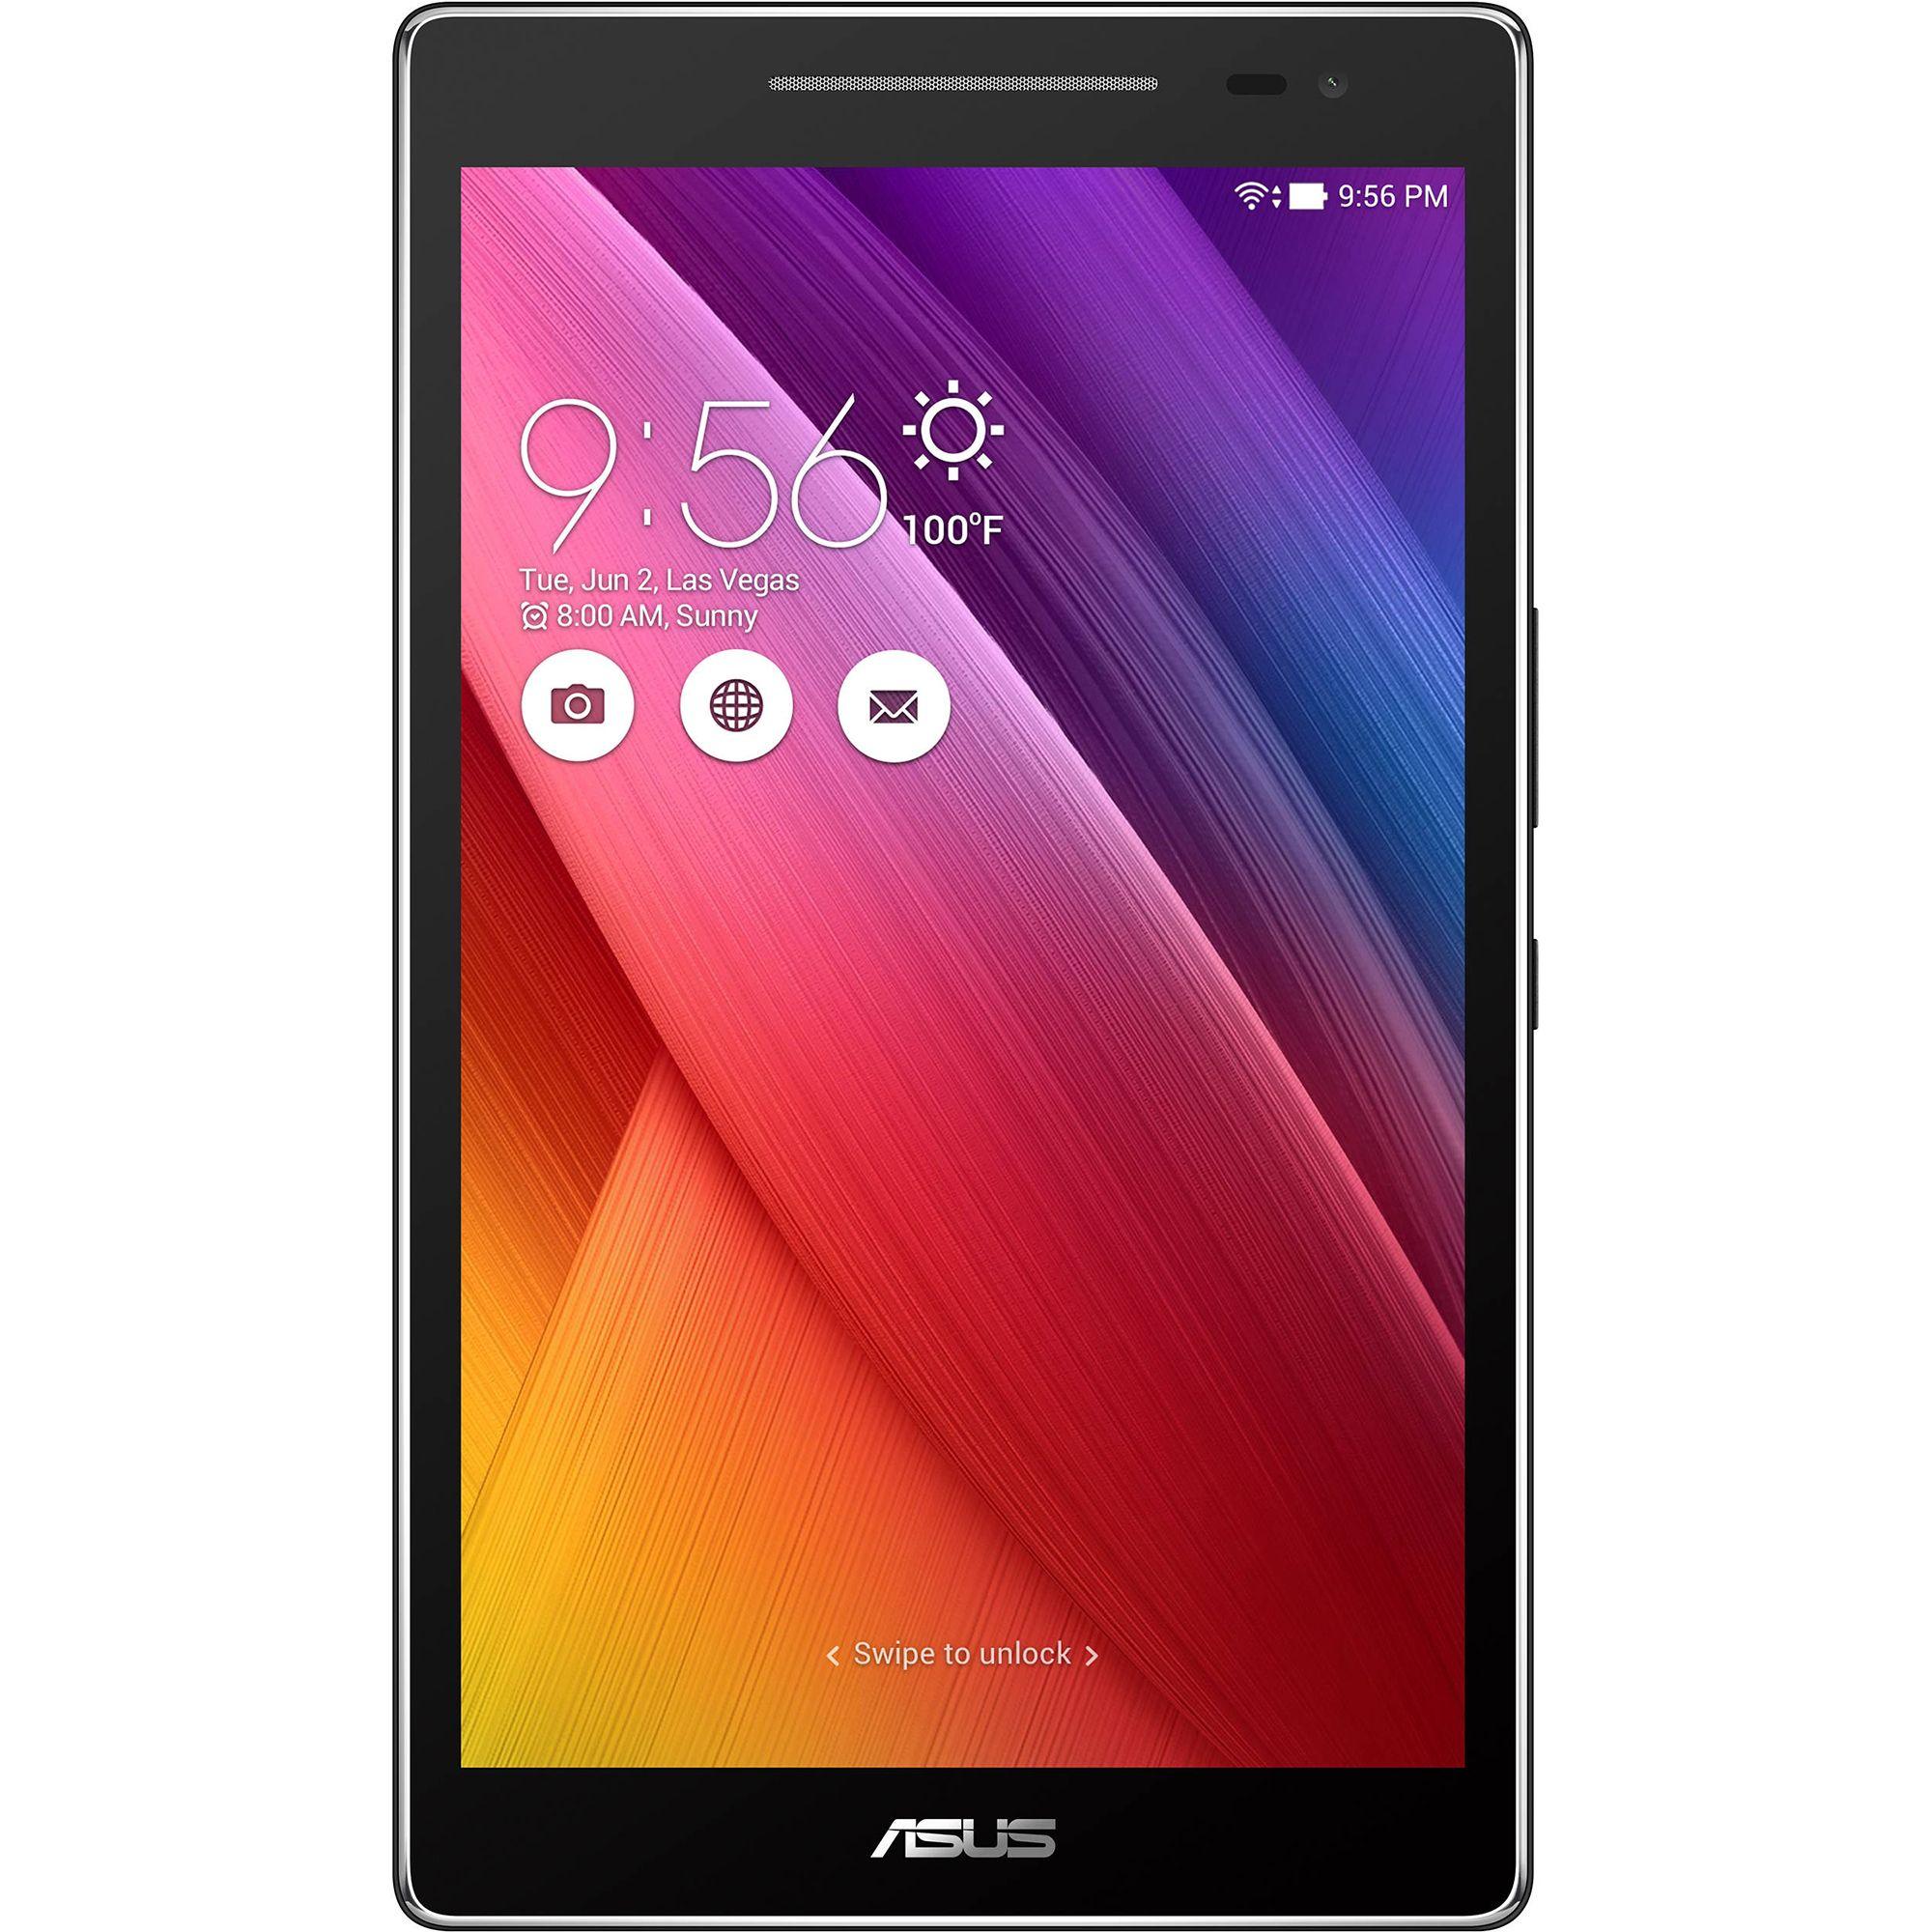 ASUS ZenPad 8.0 Z380CX-1A018A